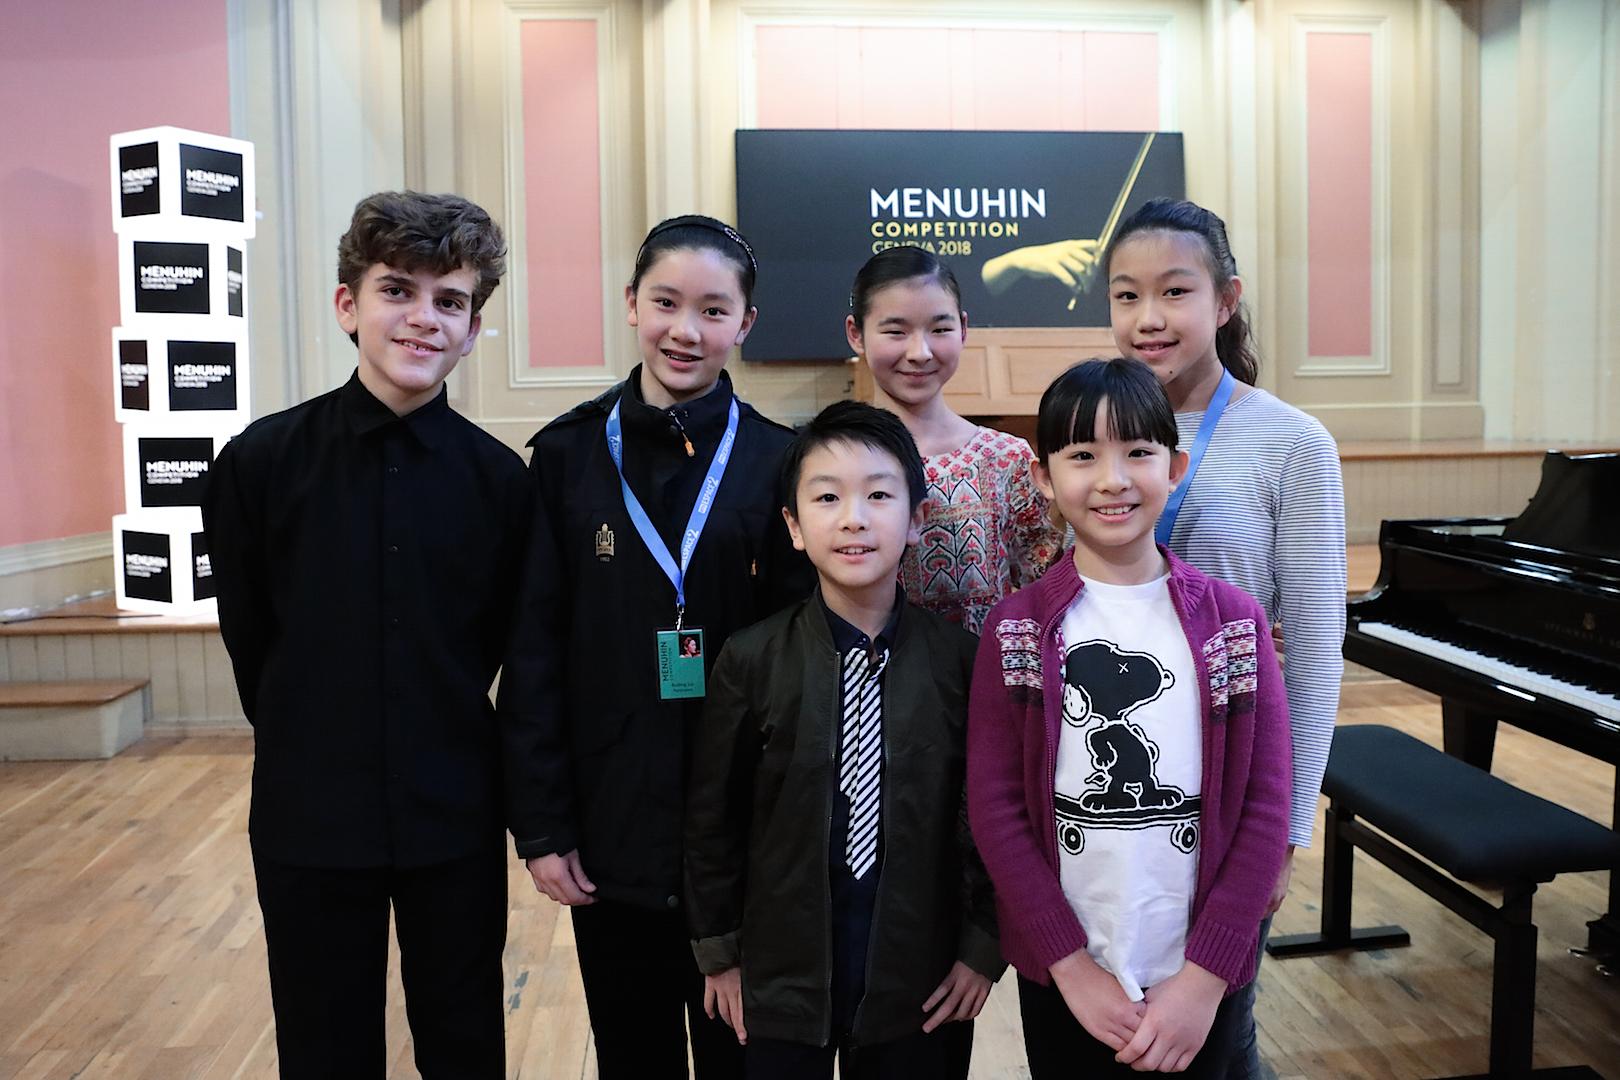 Concours Menuhin Conservatoire finalistes Juniors@Nathalie Mastail-Hirosawa.jpg